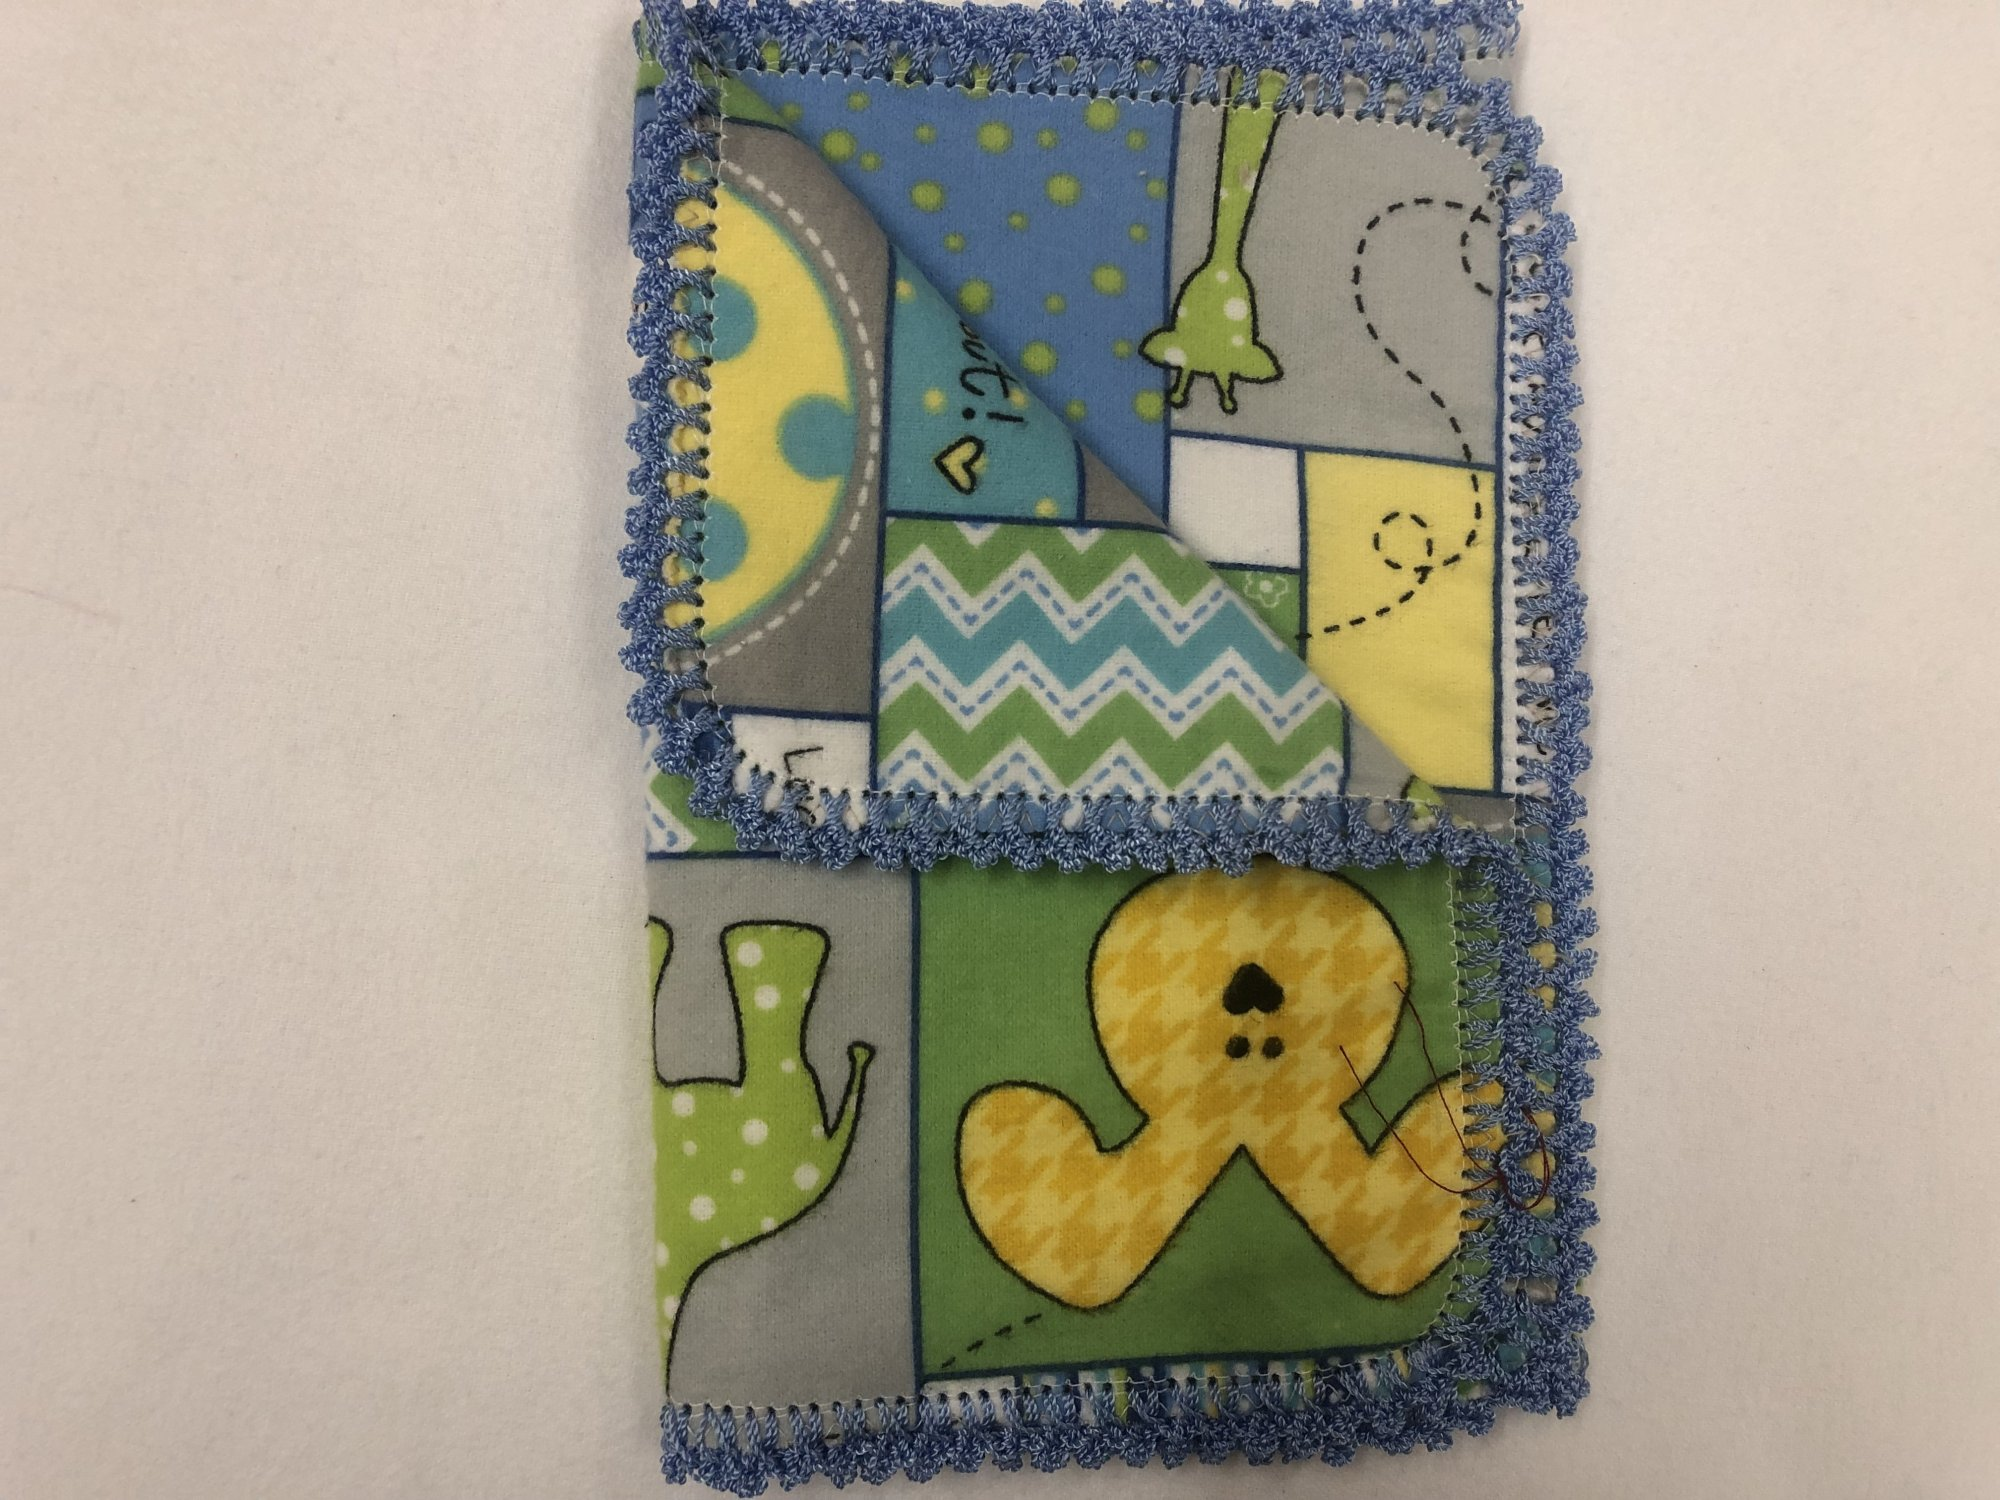 Colorful animal and chevron crocheted burp cloth